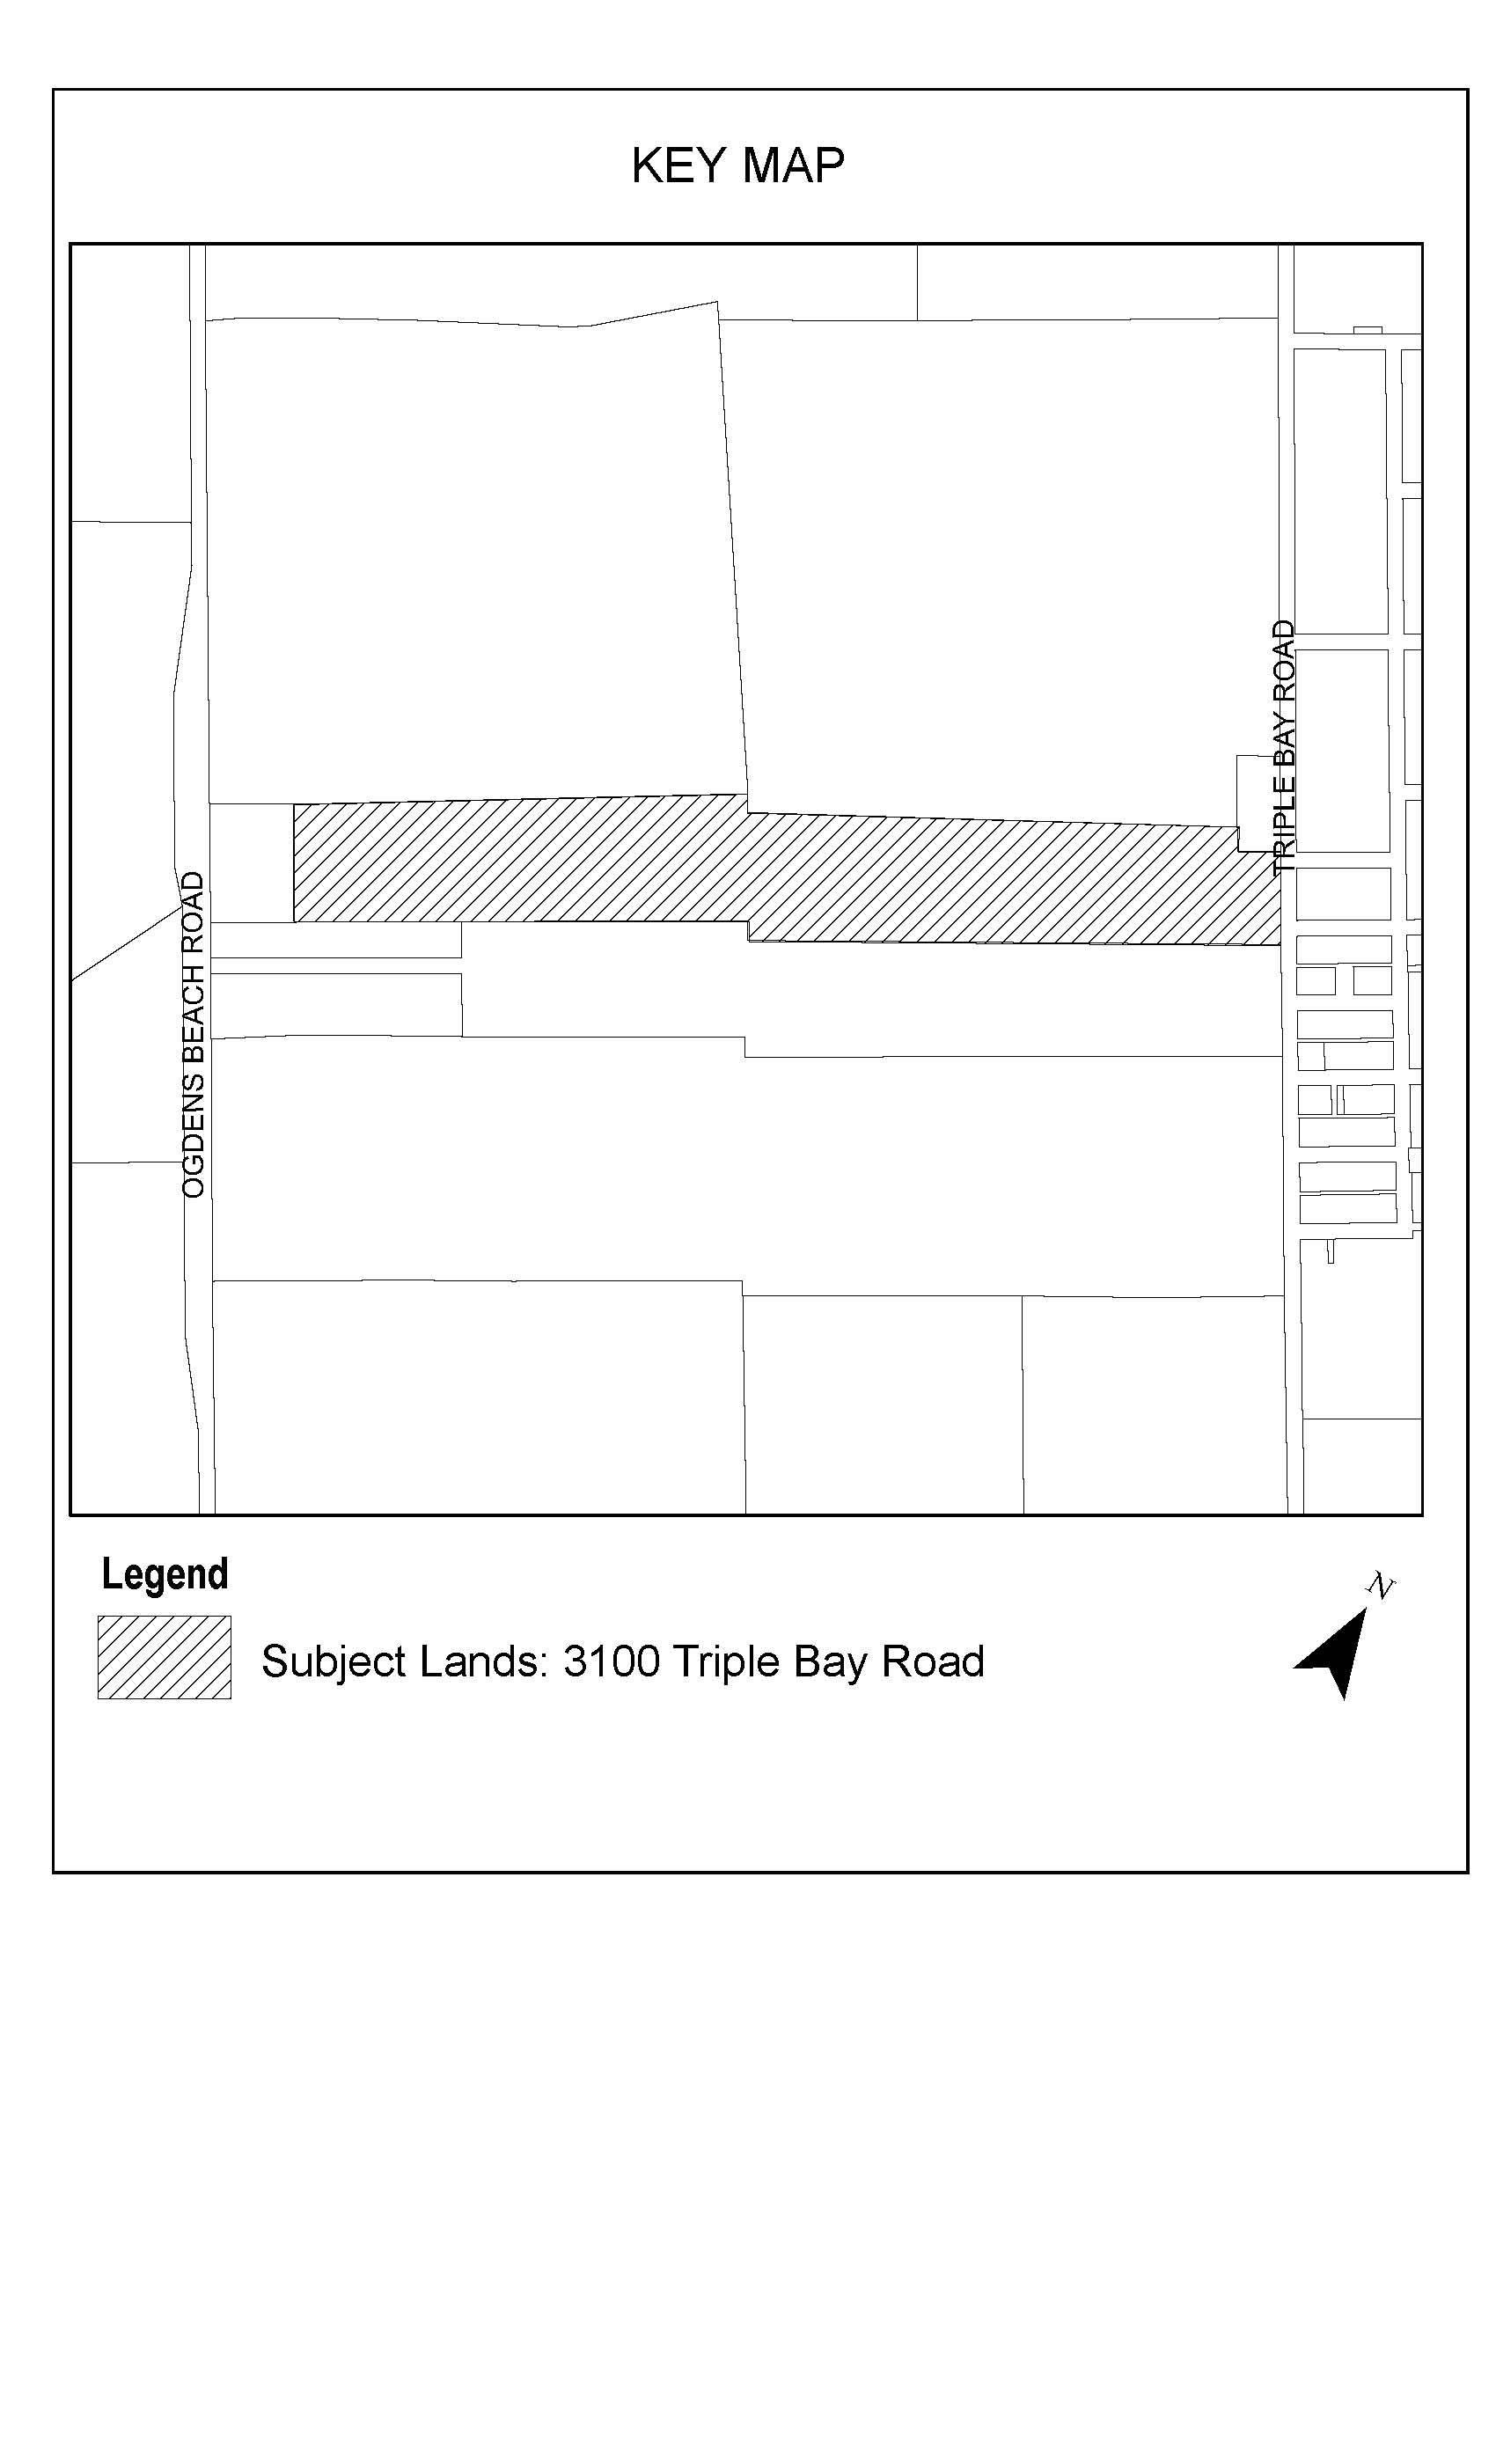 MZO 3100 Triple Bay Road - Key Map